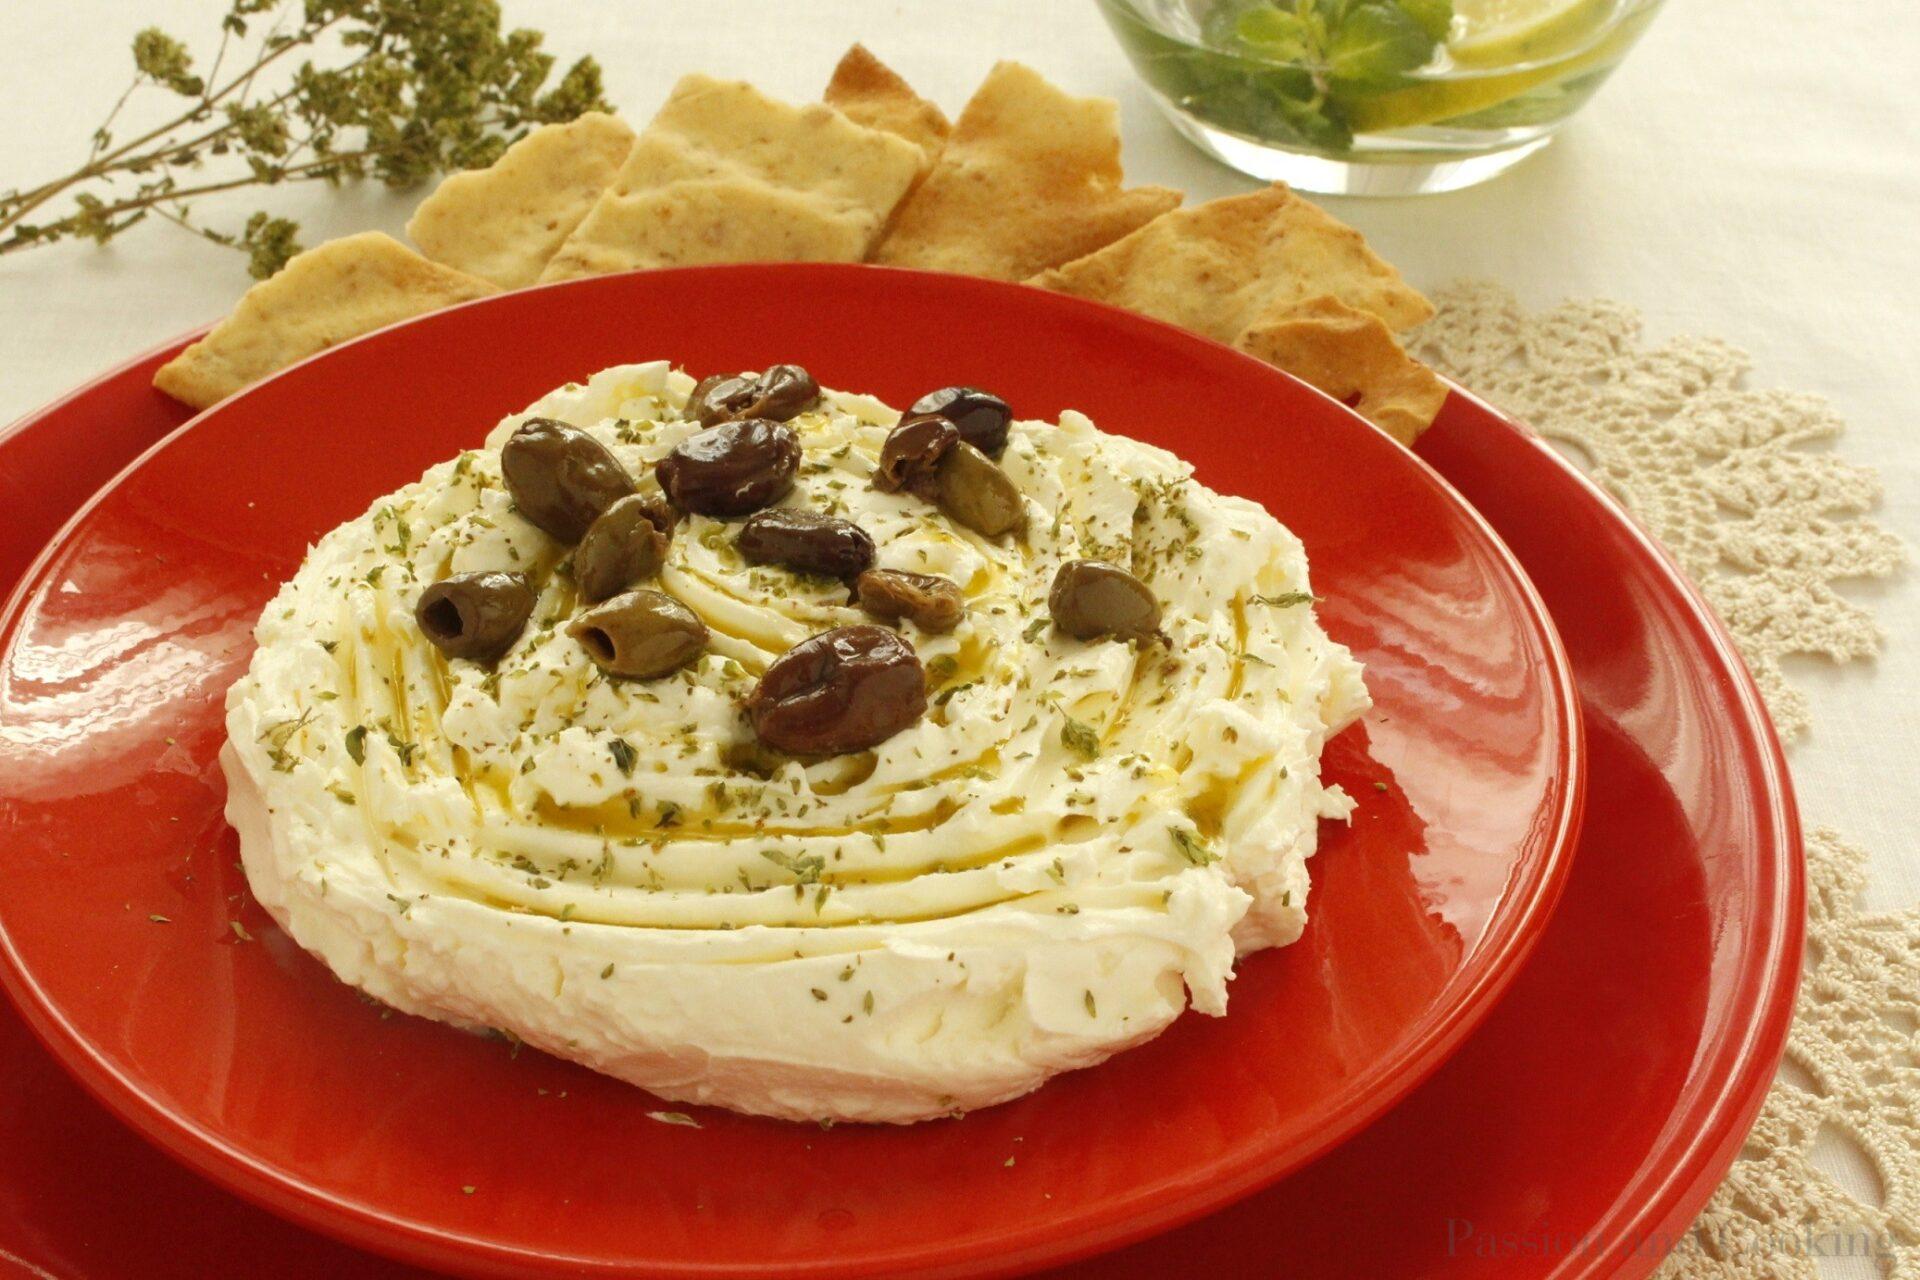 Cheese made with strained yogurt